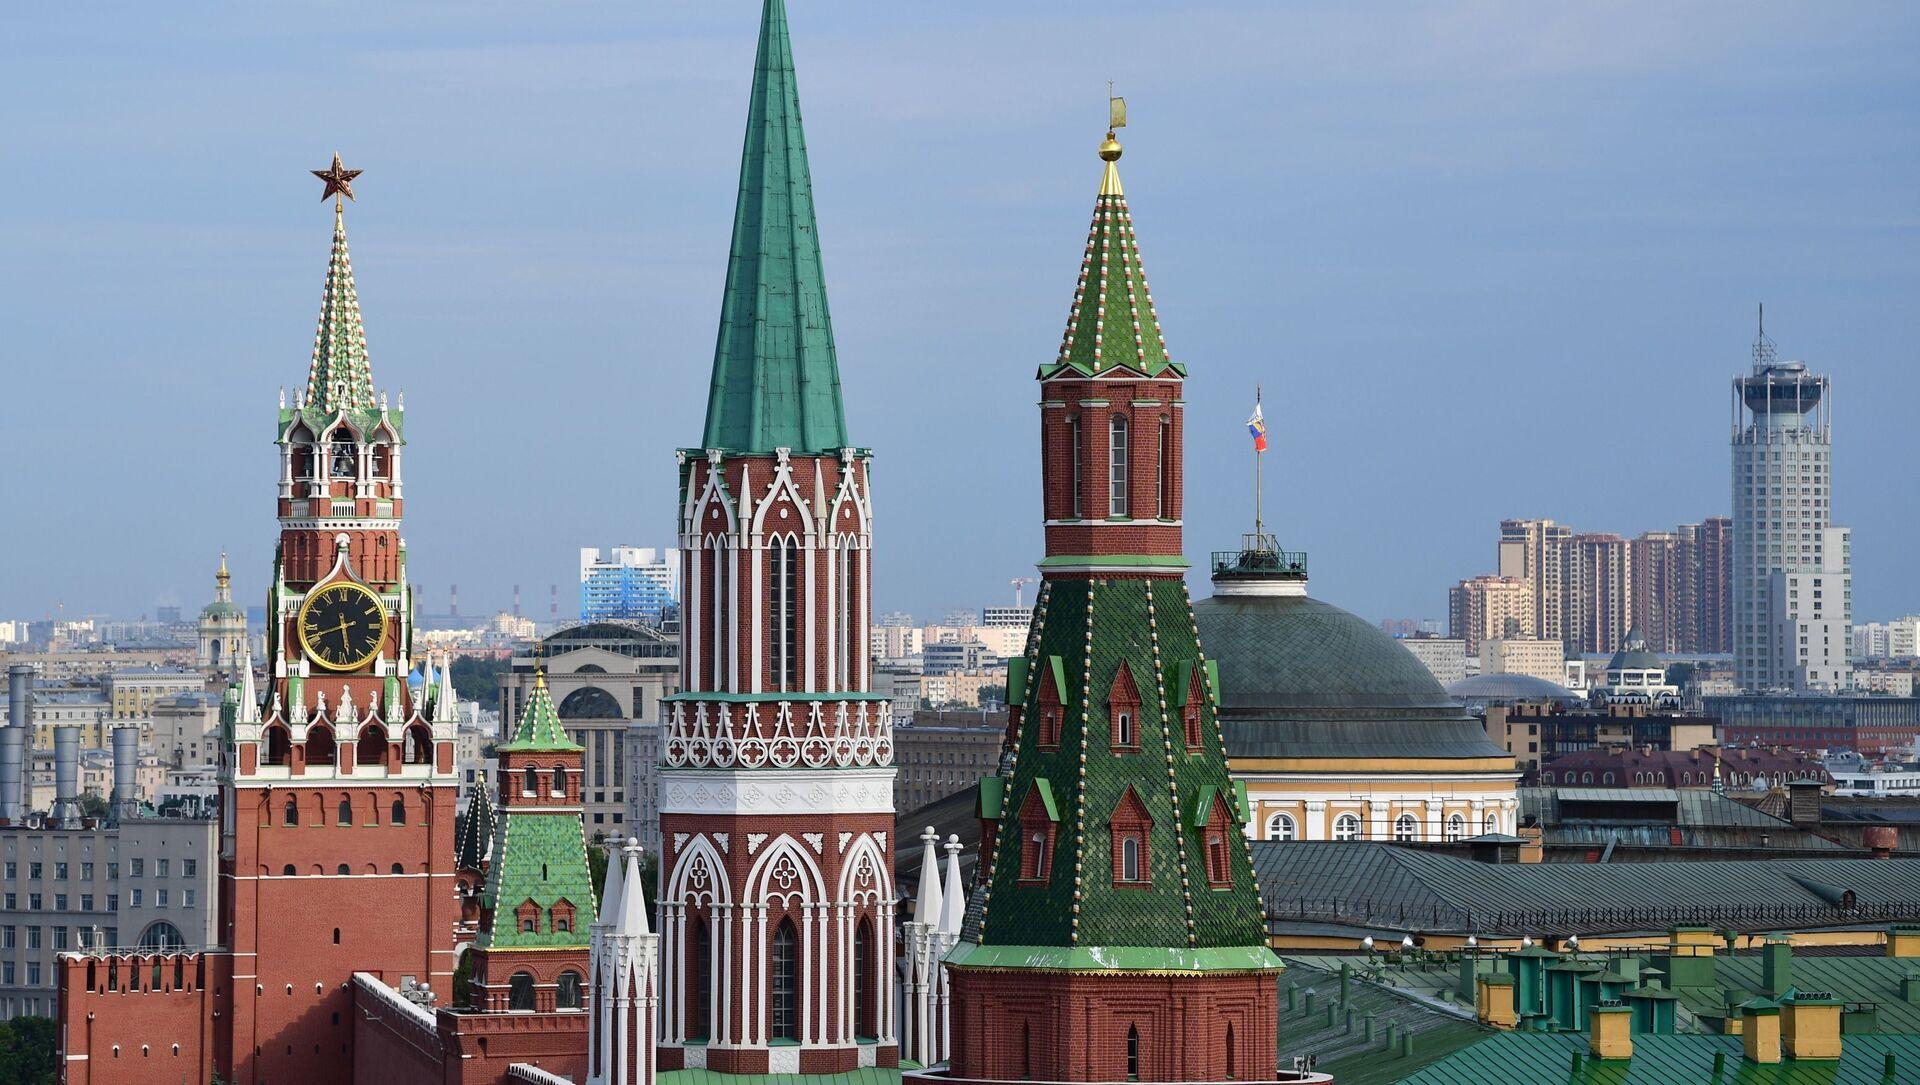 Le Kremlin de Moscou - Sputnik France, 1920, 22.03.2021